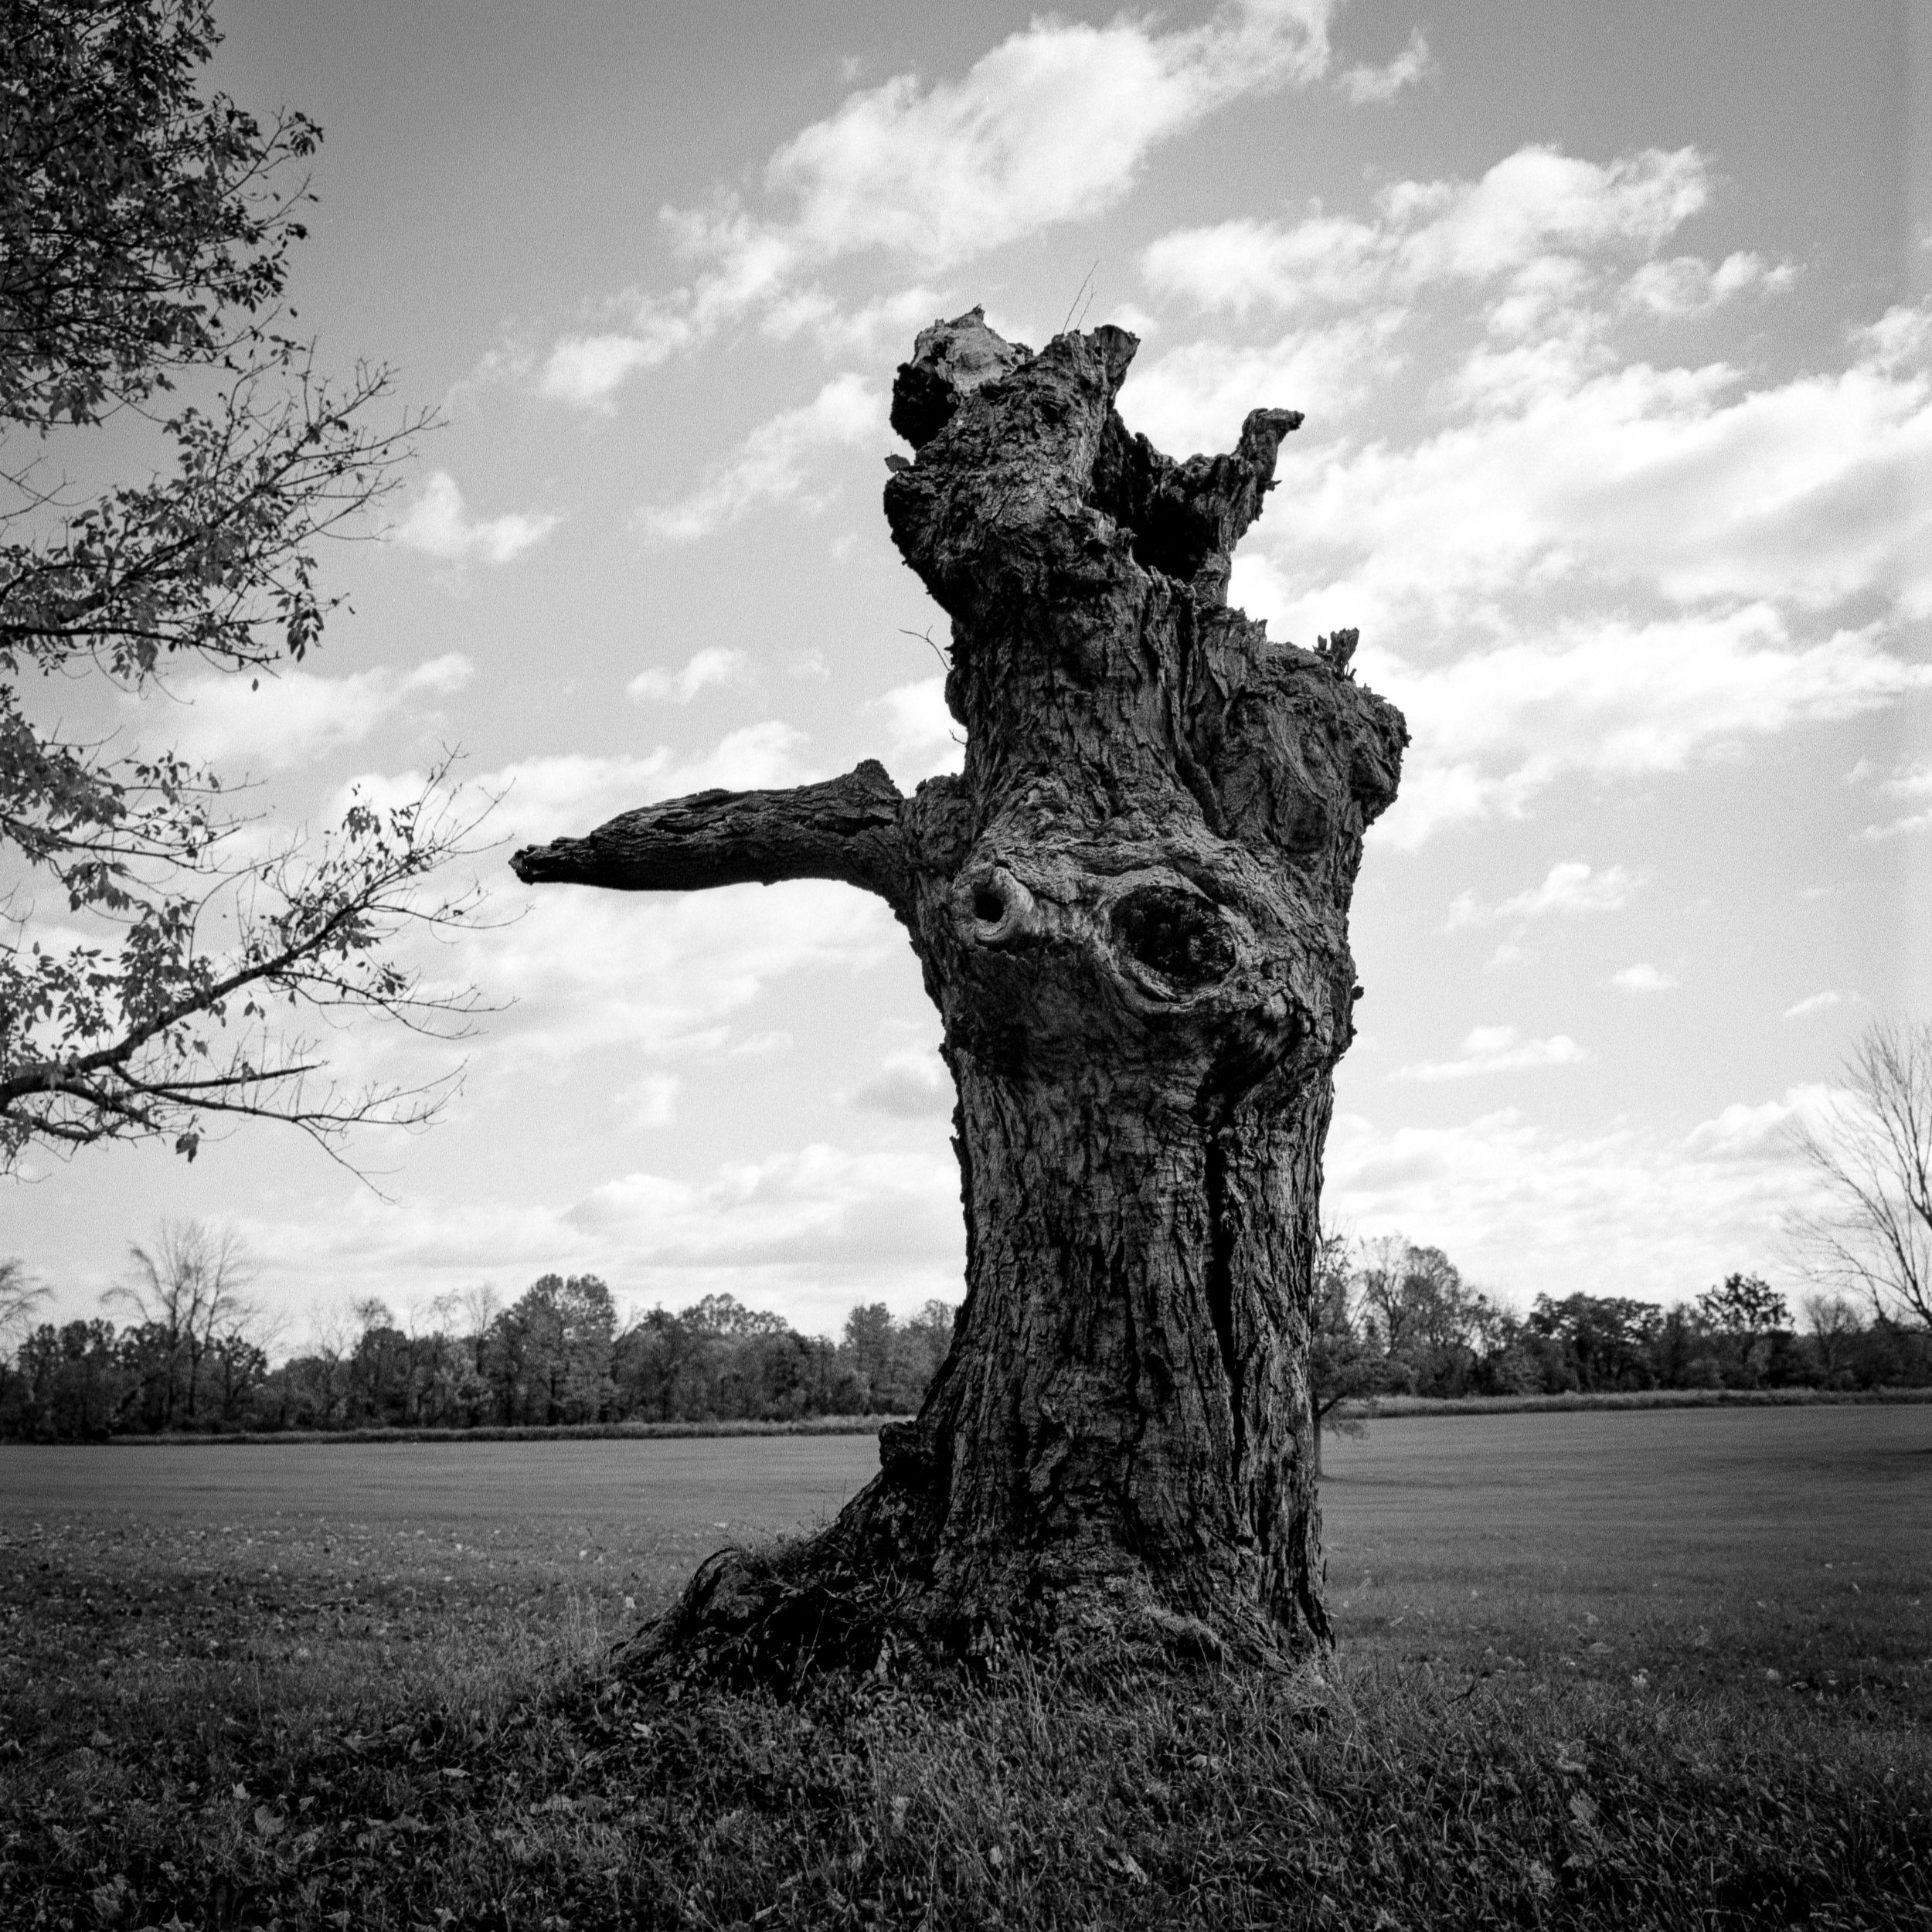 A Once Mighty Oak - 2016